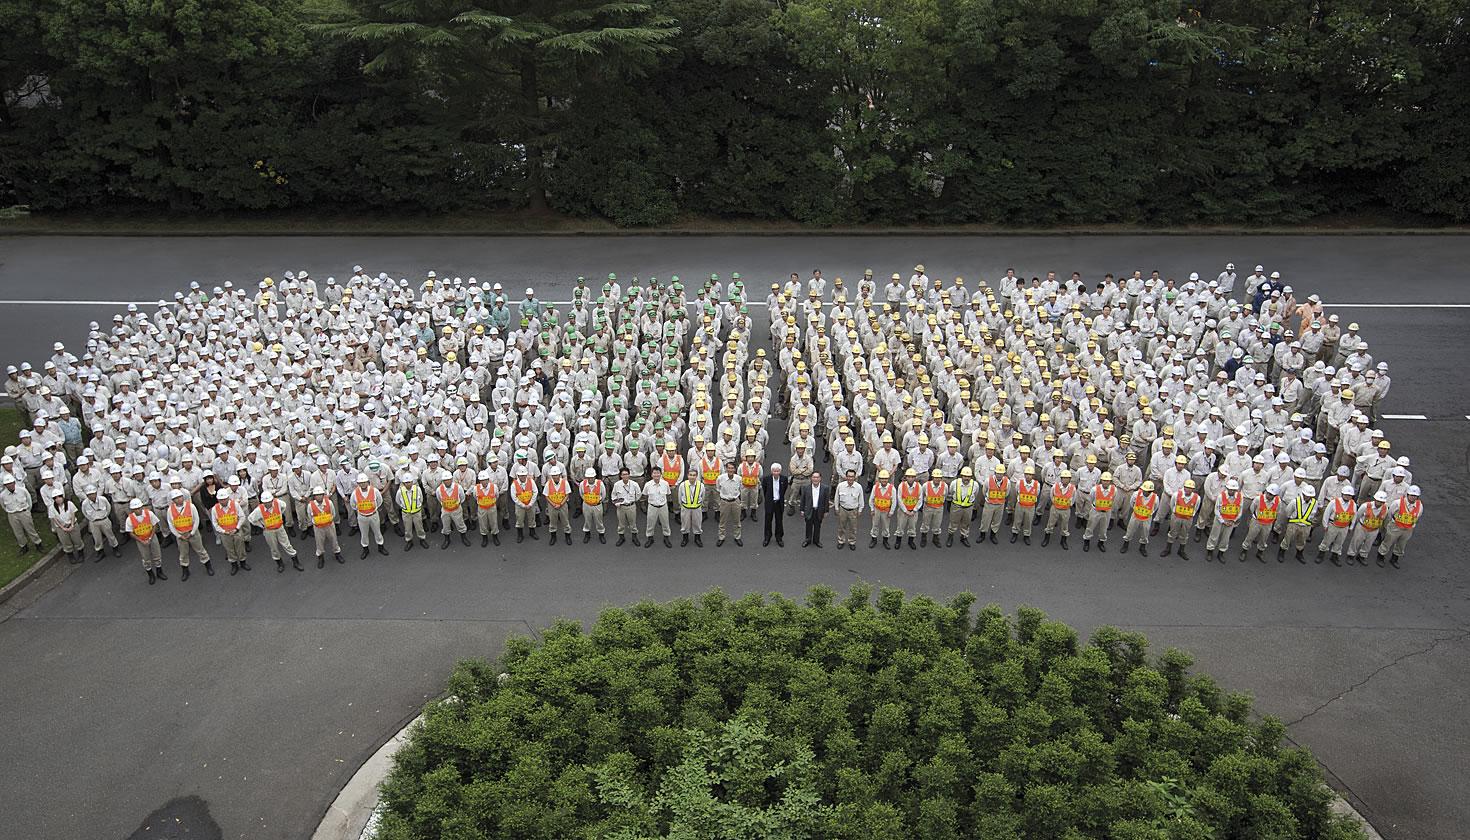 Tsuchiura Works factory employees